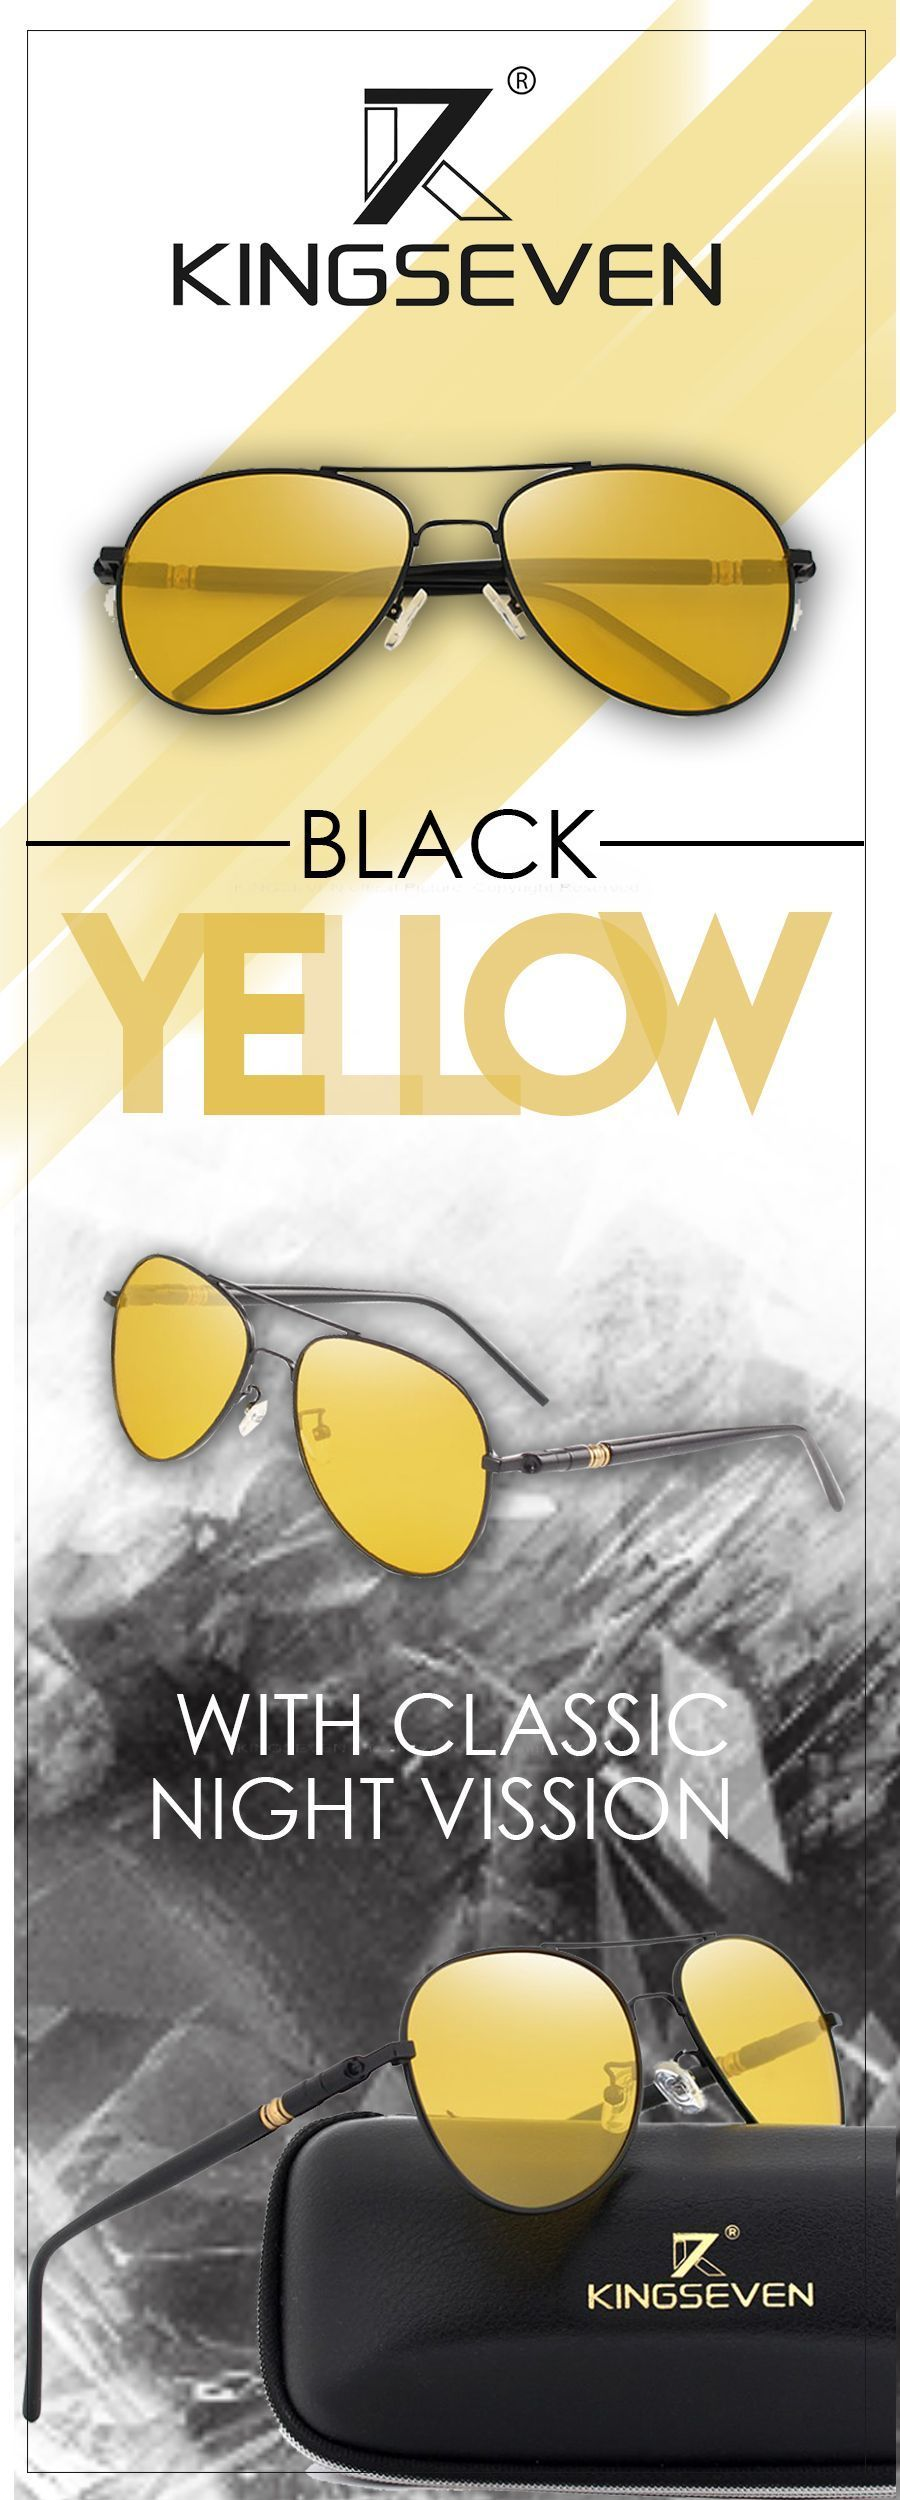 Menus polarized night driving sunglasses kingseven designer